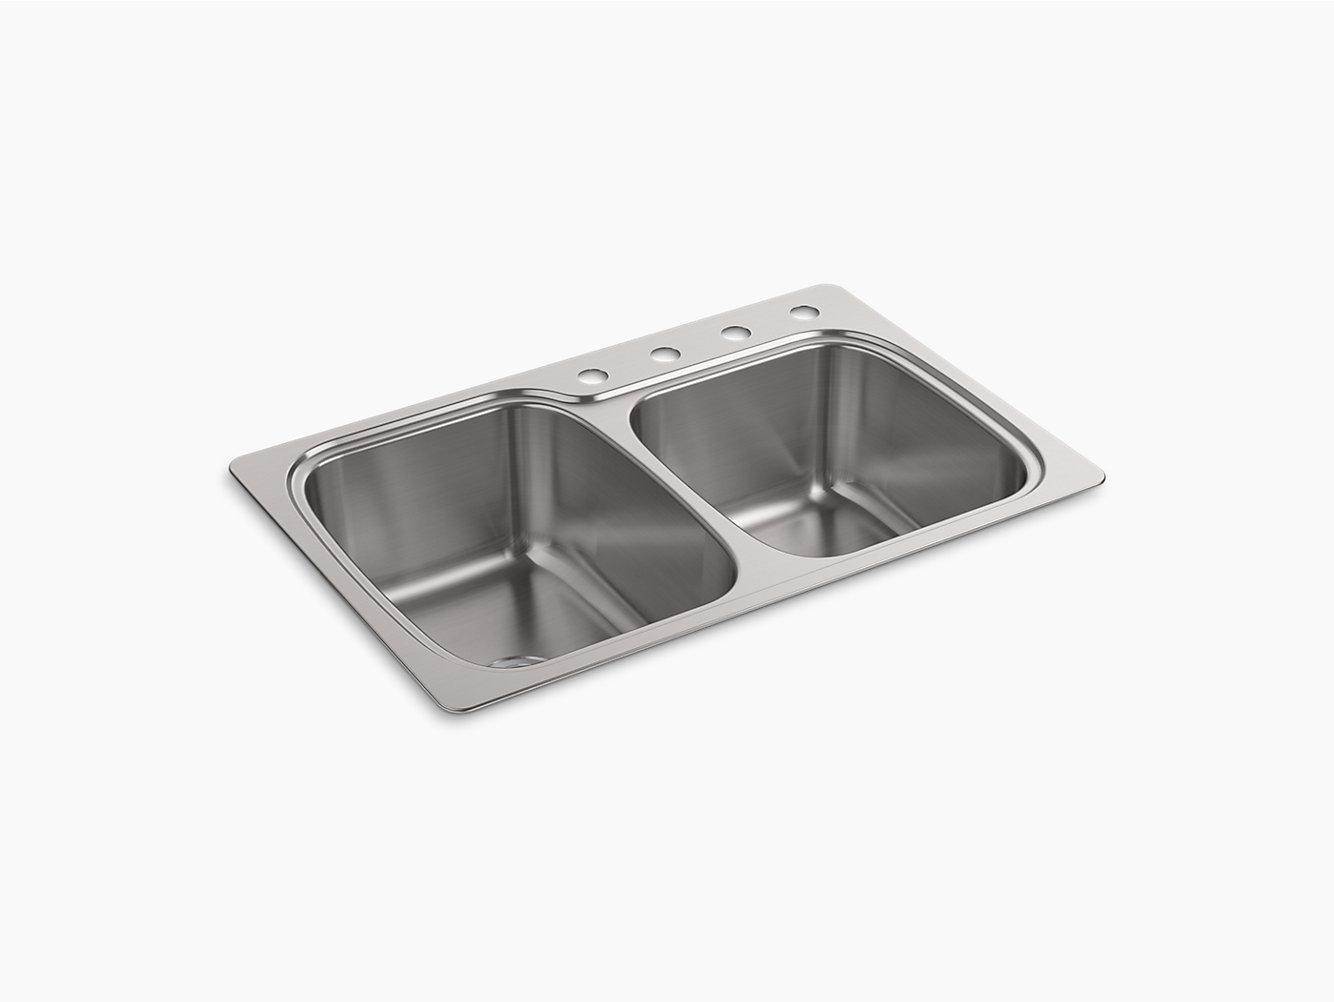 Large Medium Double Bowl Kitchen Sink